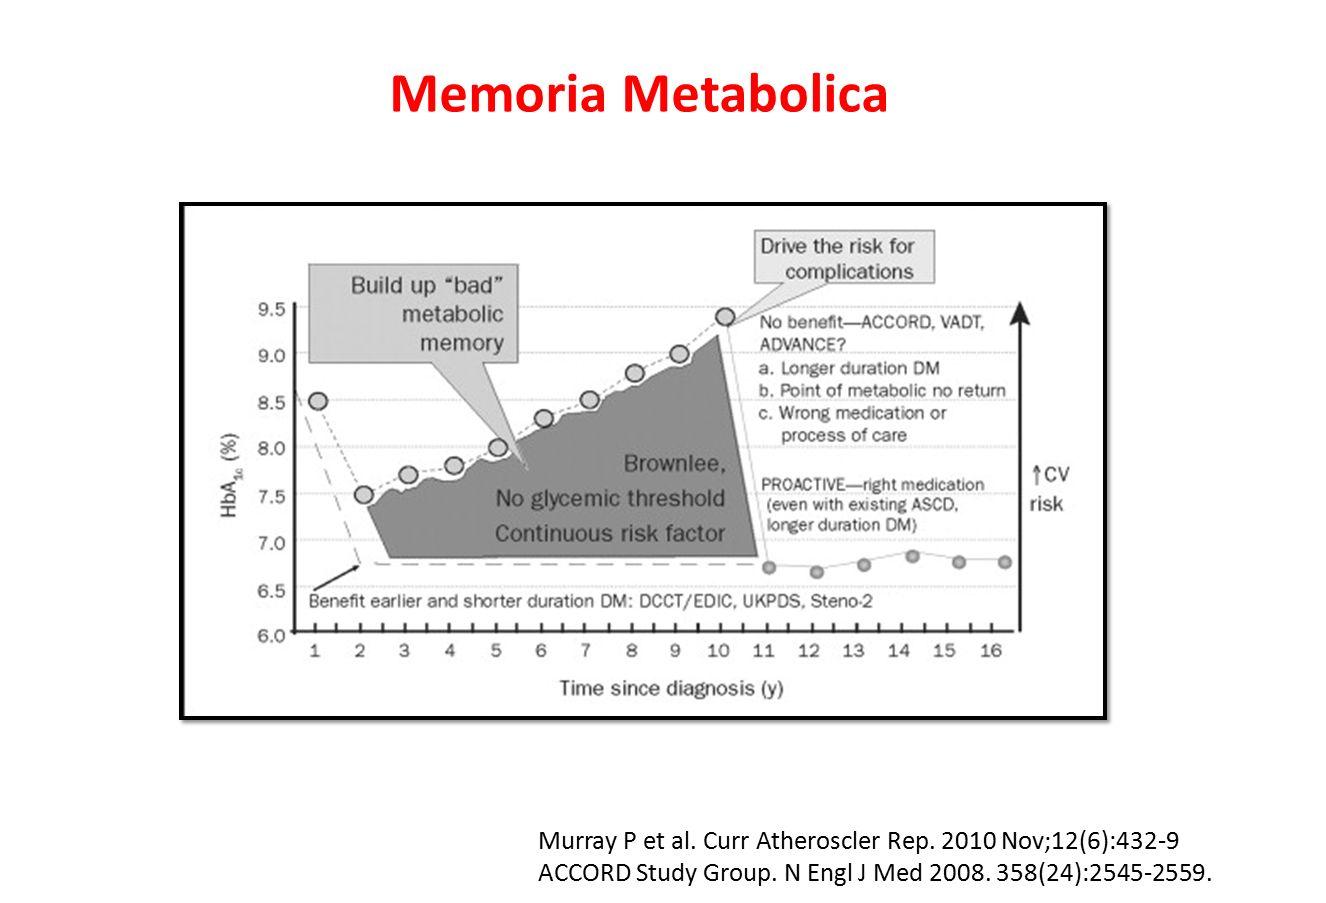 Memoria Metabolica